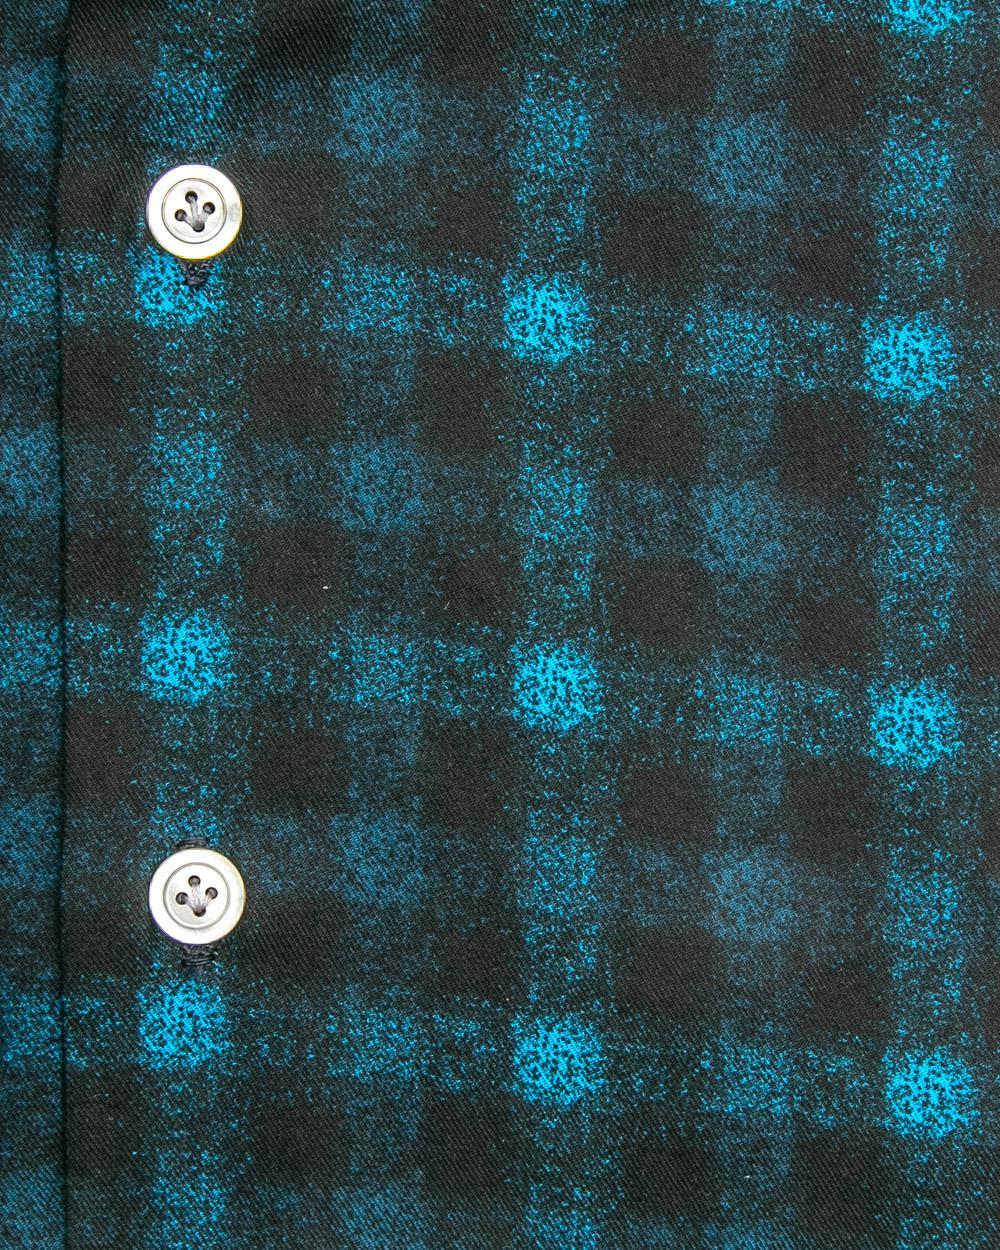 59009345f6 Lyst - Kiton Aqua Check Flannel Dress Shirt in Blue for Men